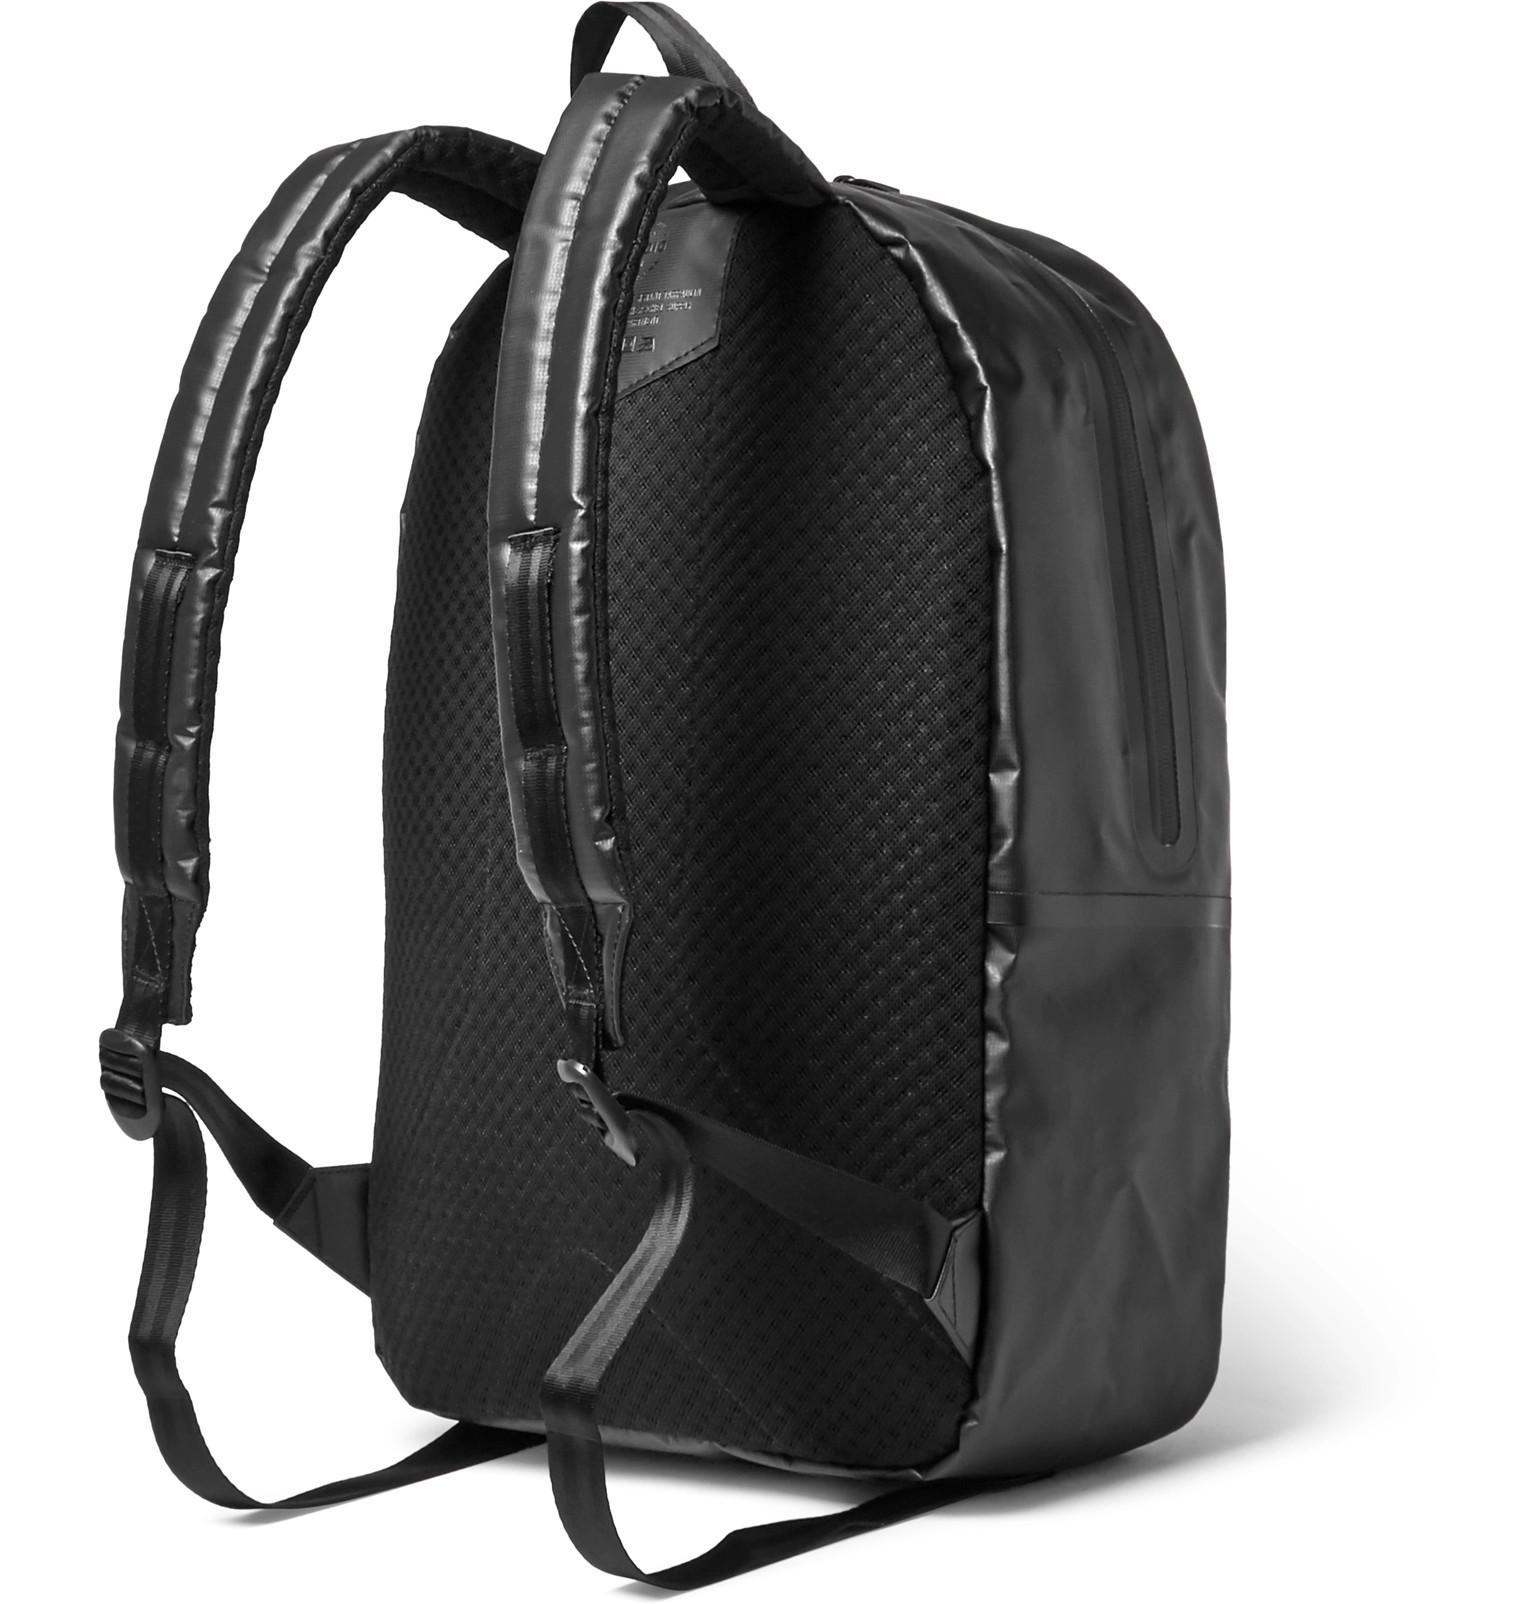 a2062bbd2f8 Herschel Supply Co. Settlement Tarpaulin Backpack in Black for Men - Lyst